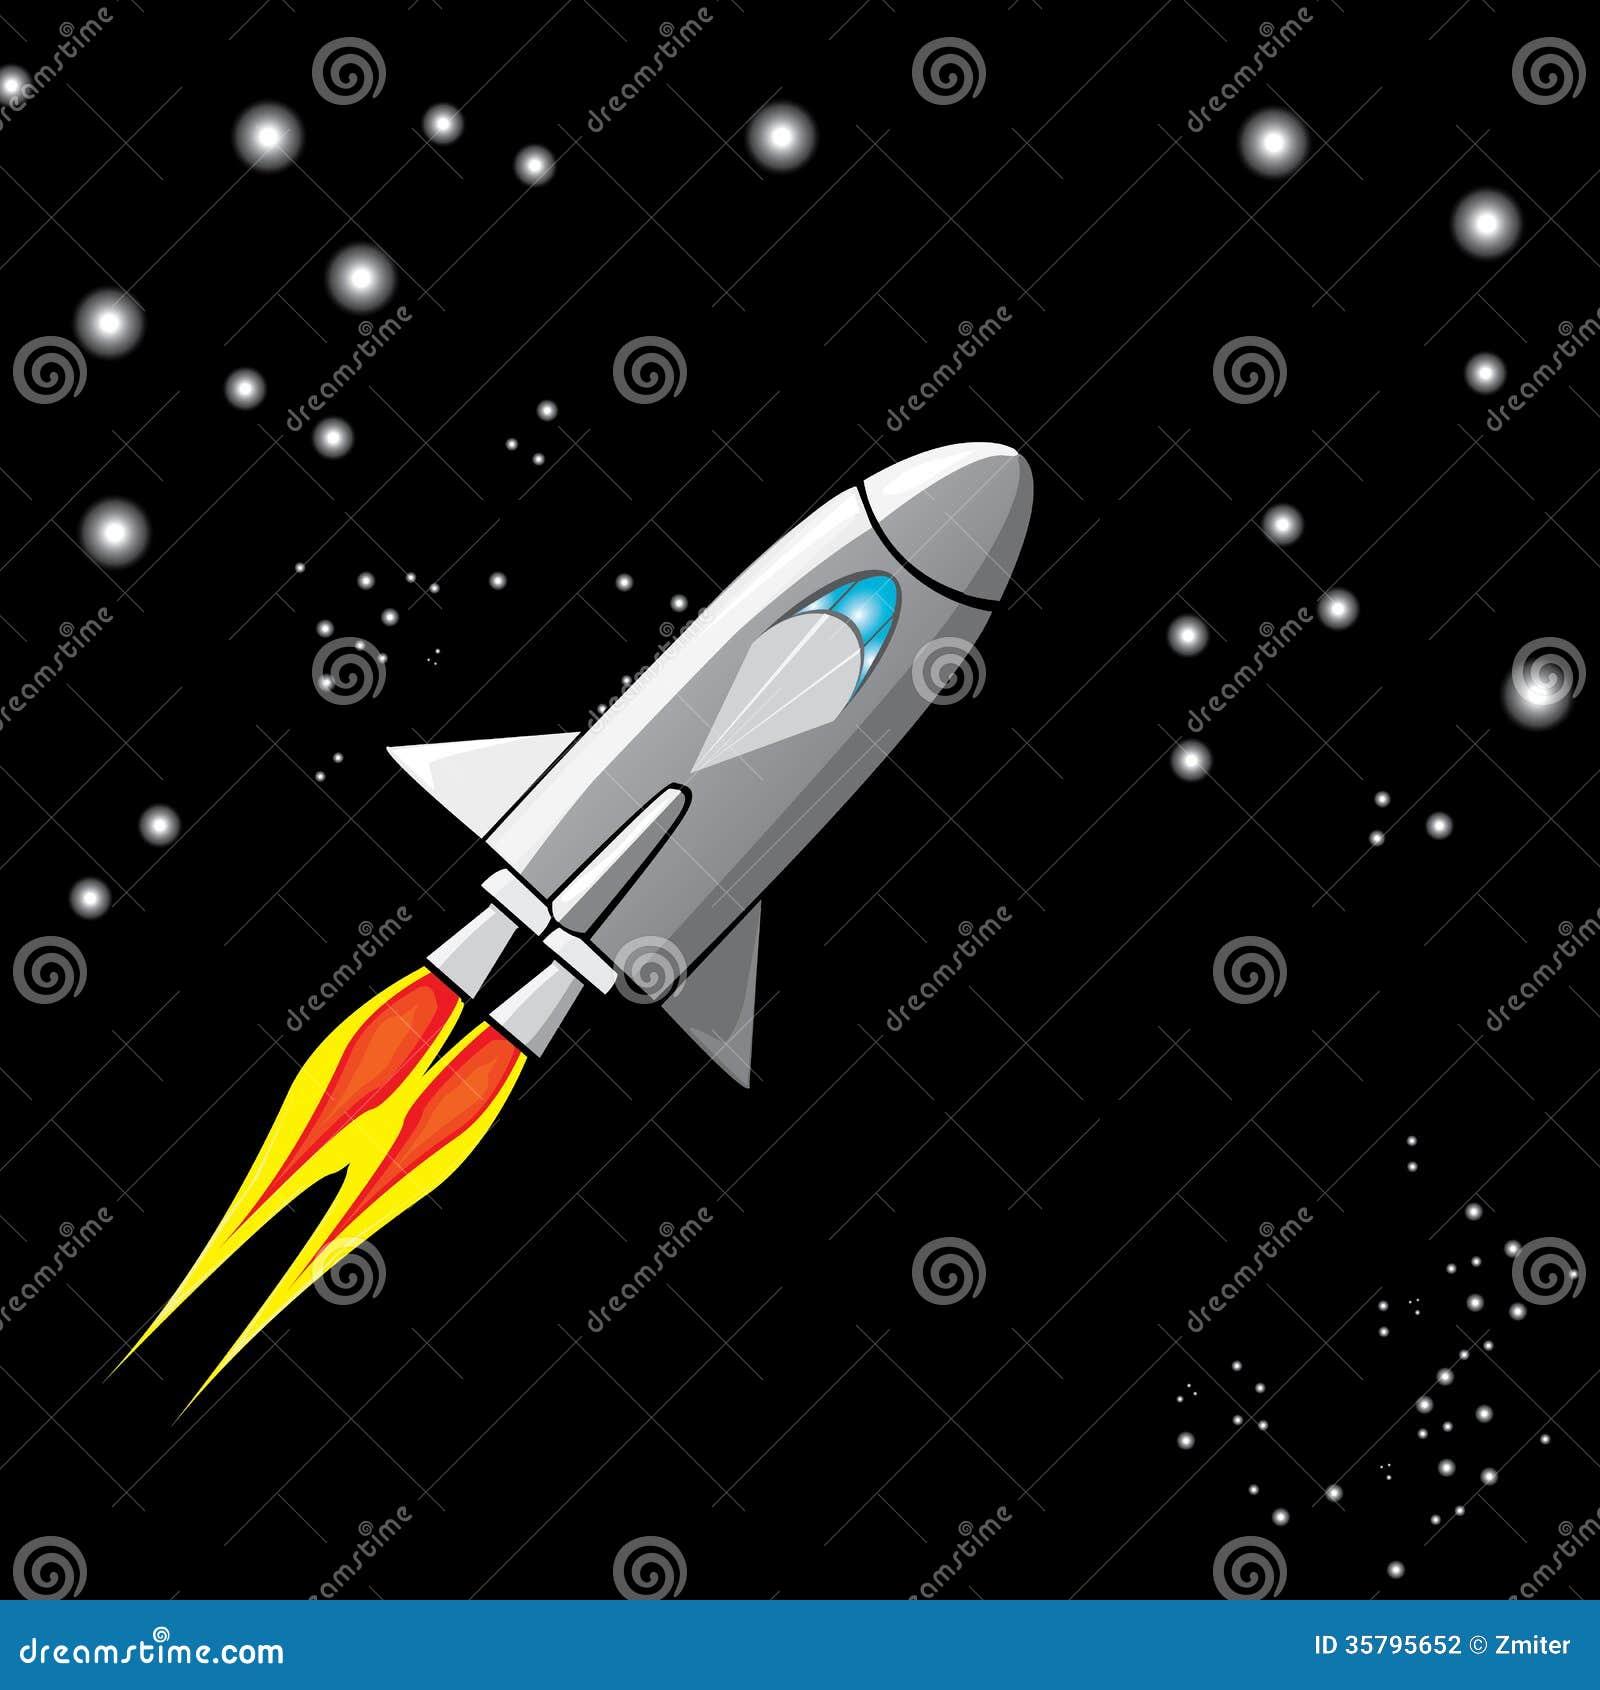 Vector Retro Rocket Ship Space In The Sky. Stock ...